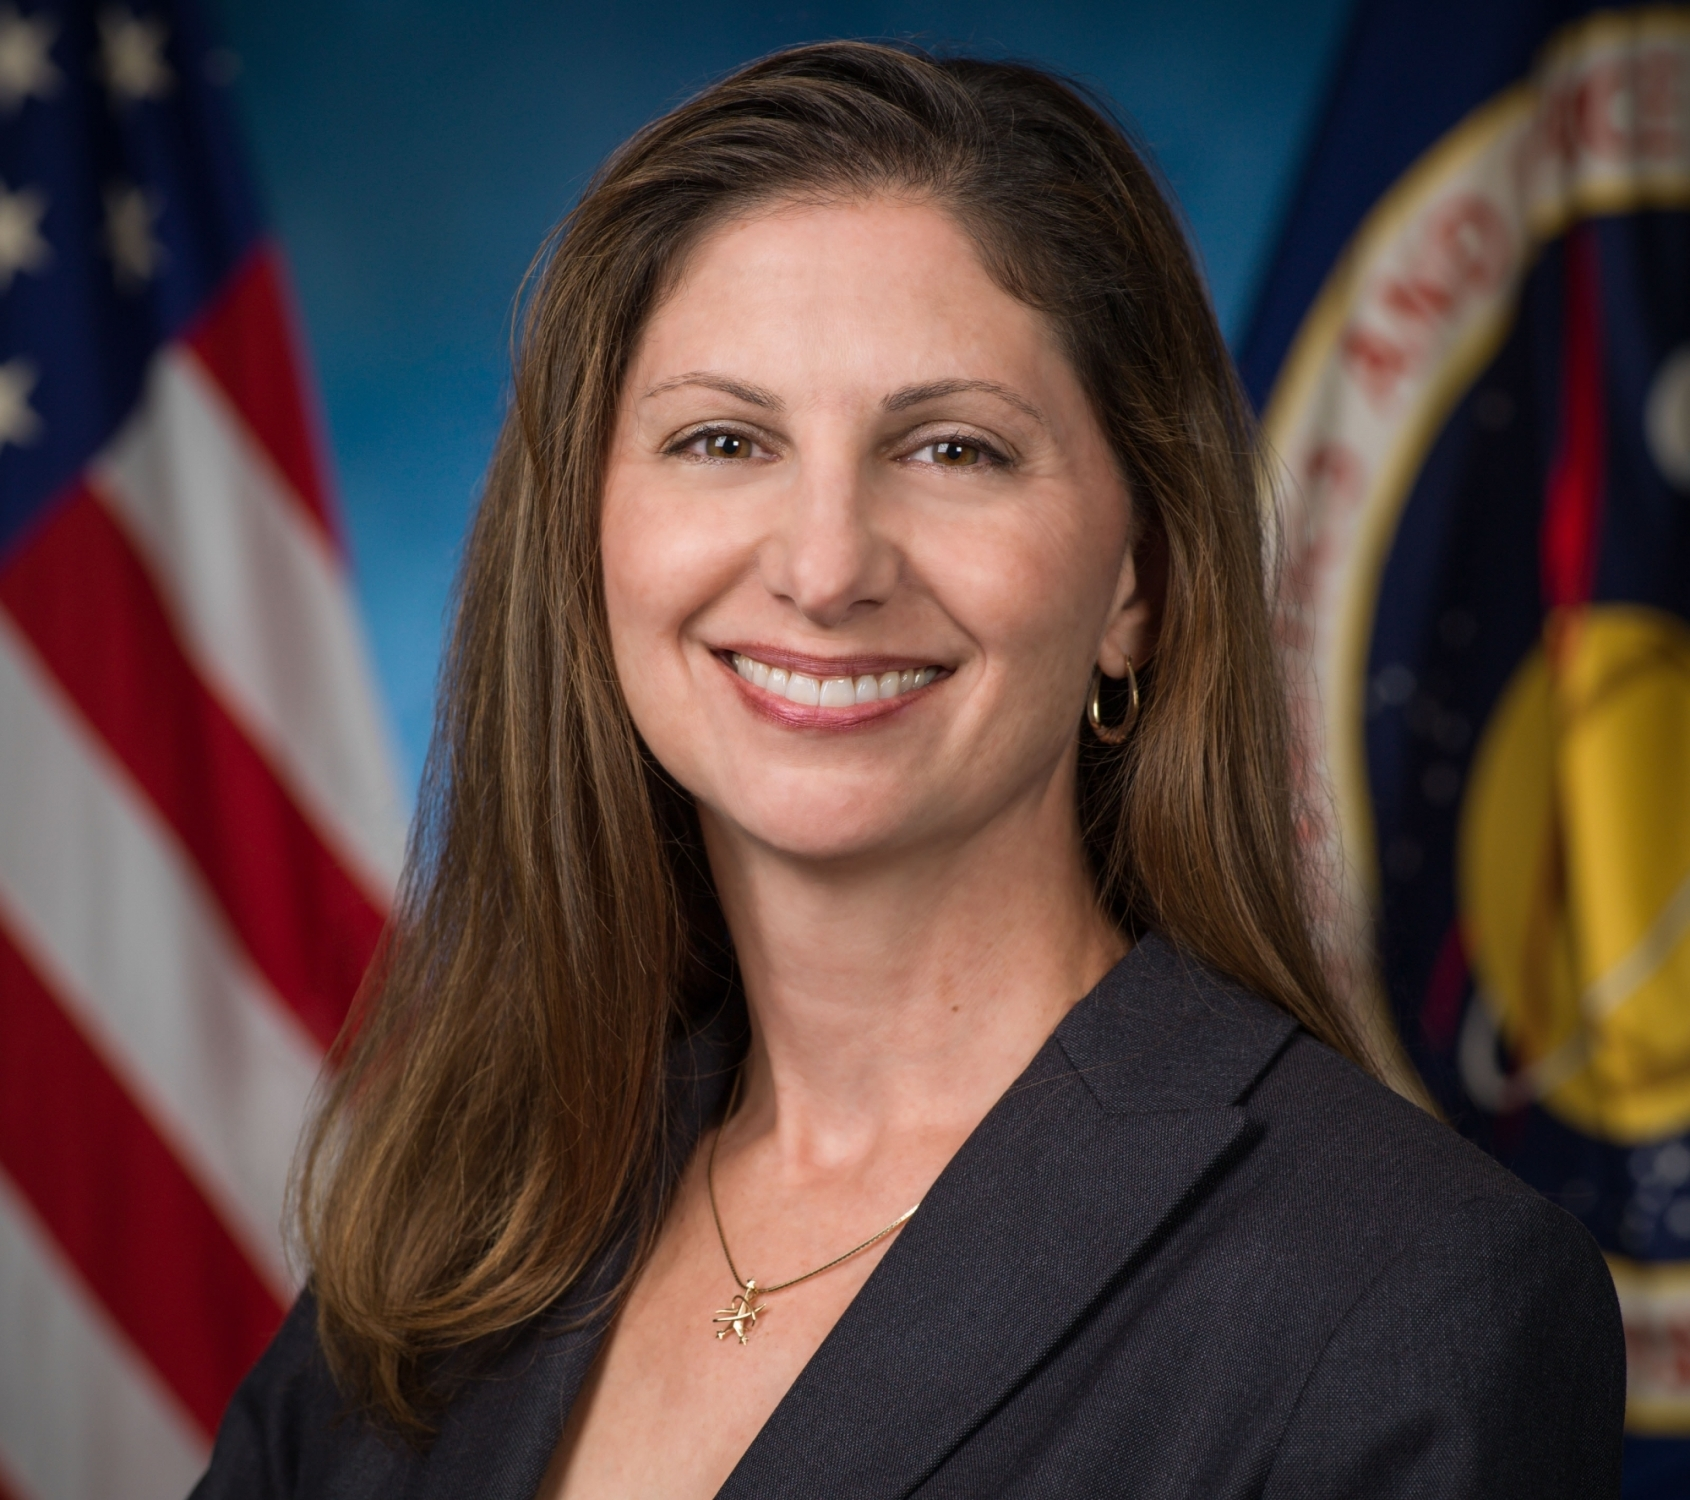 NASA picks Catherine Koerner as Manager of Orion programme - The Rahnuma Daily